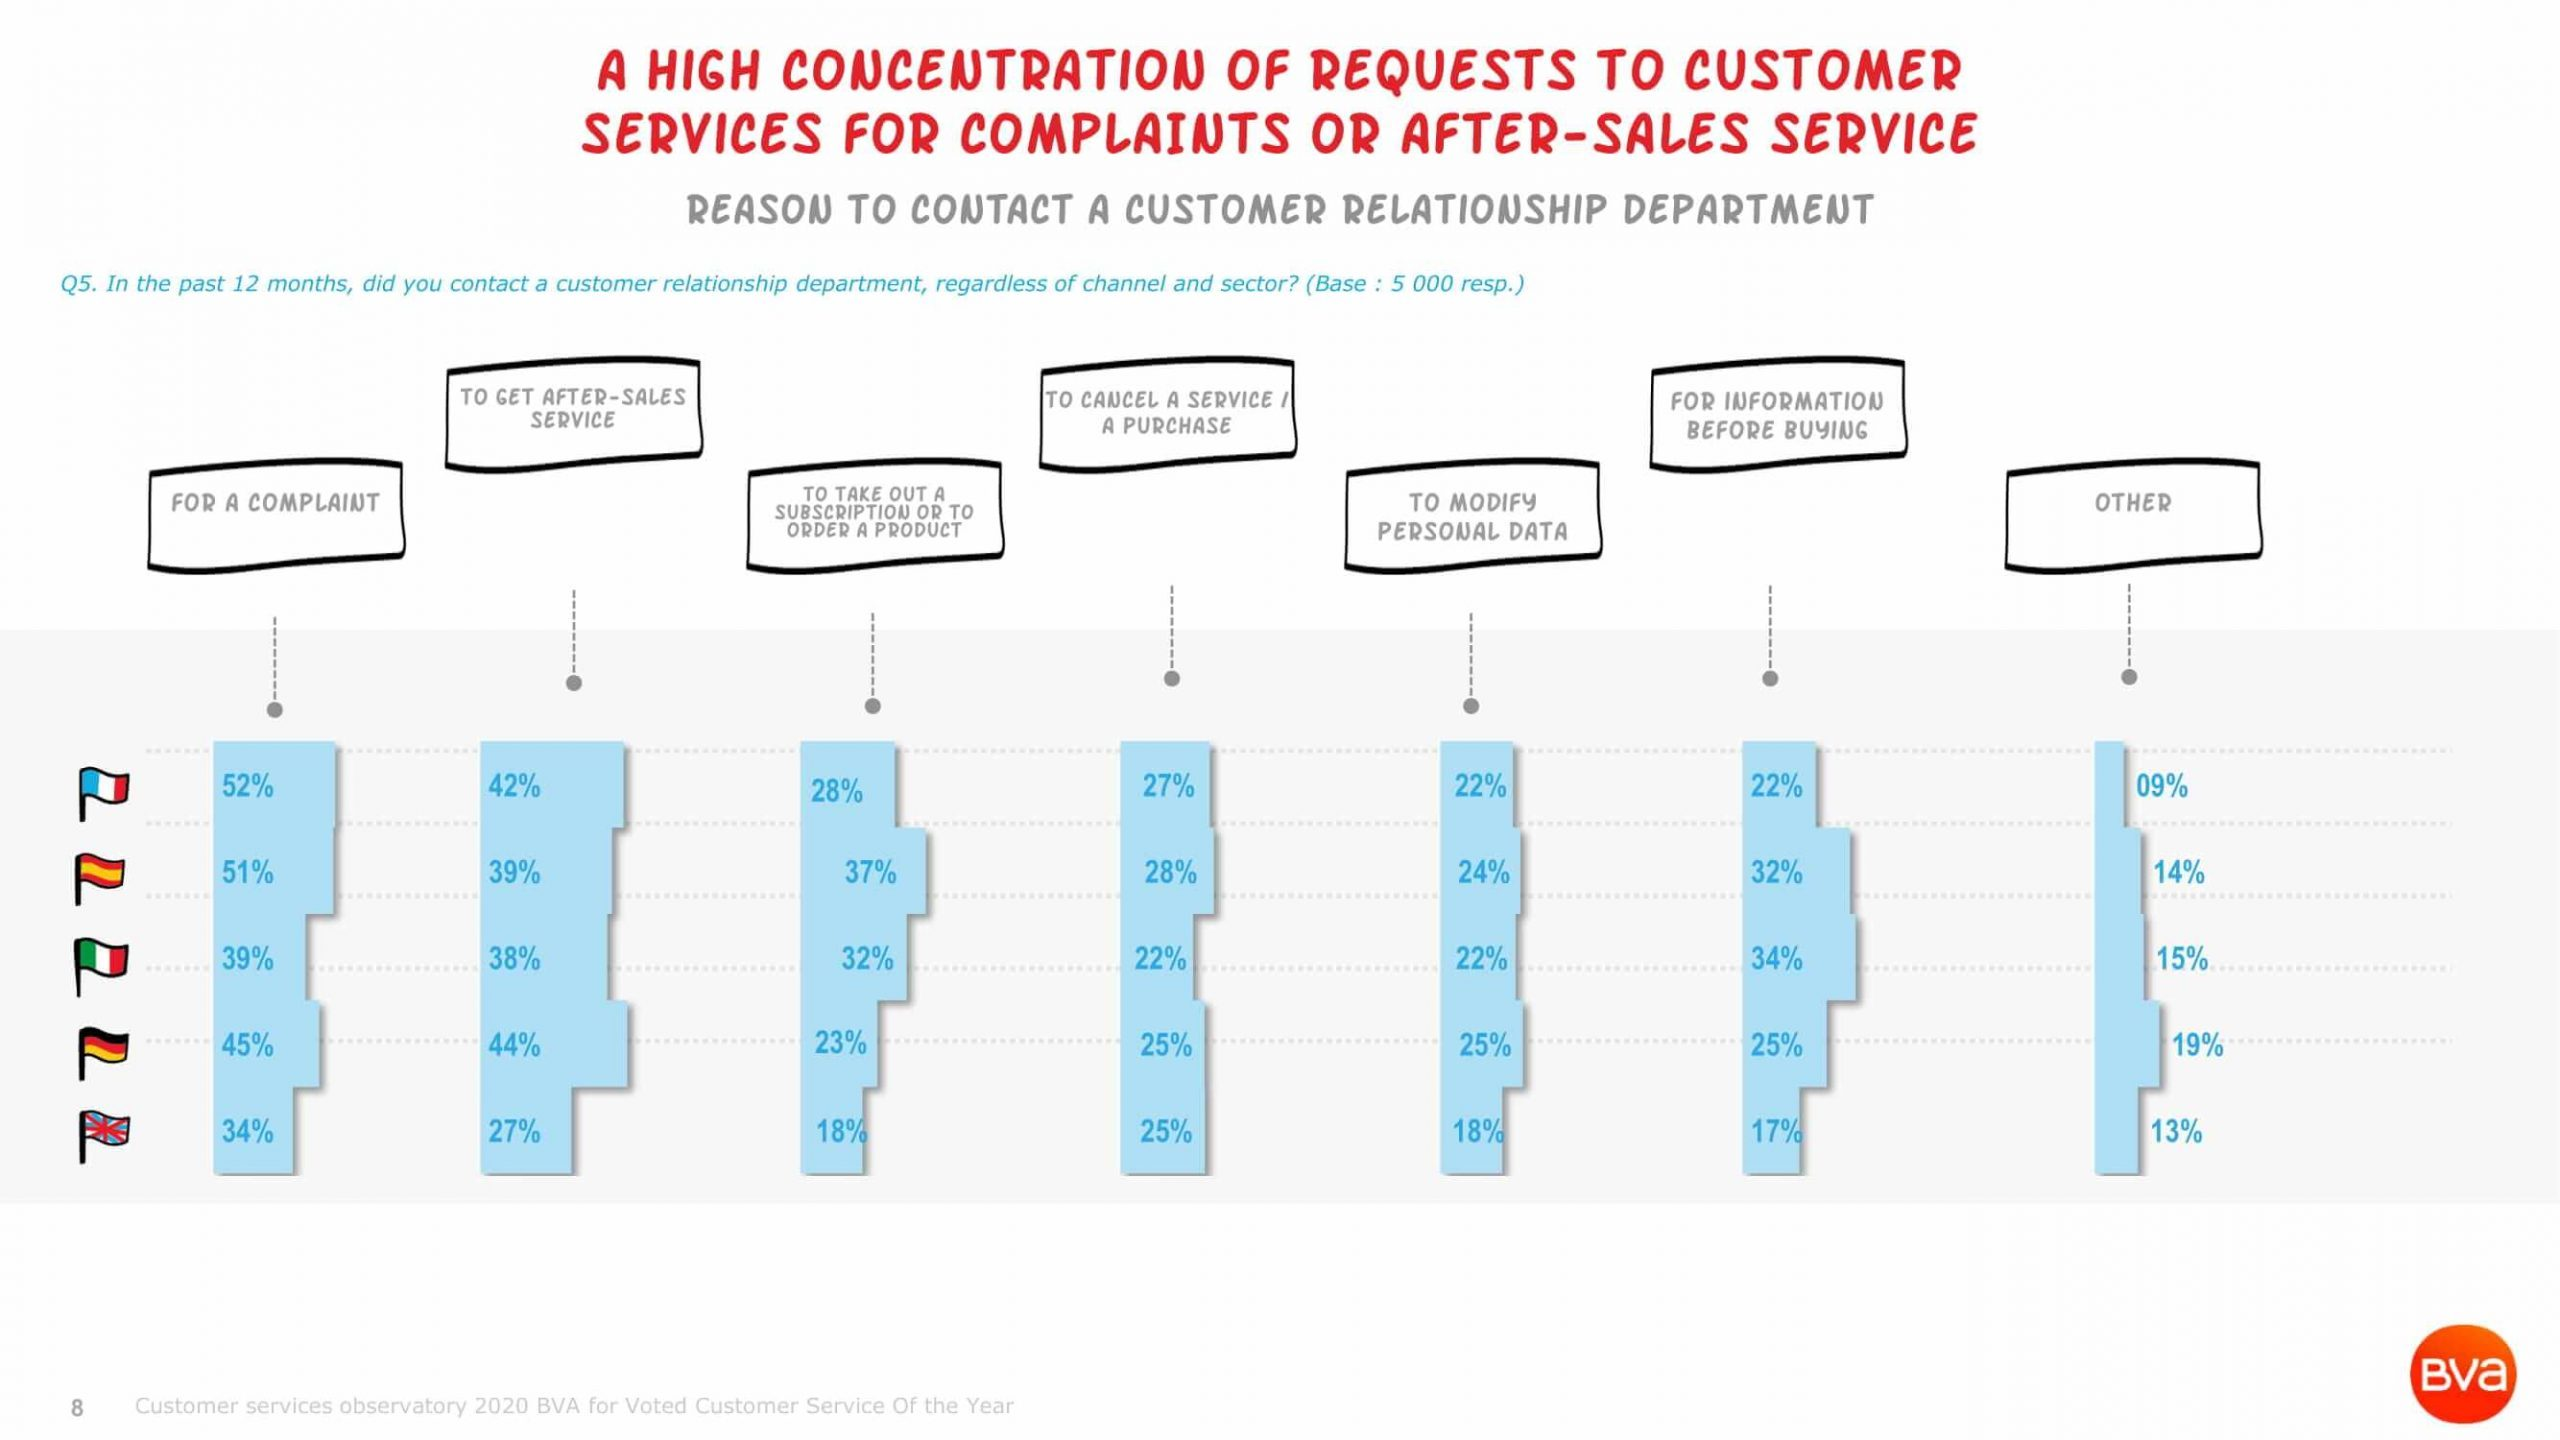 Escda Bva Observatoire Des Services Clients 2020 Benchmark 08